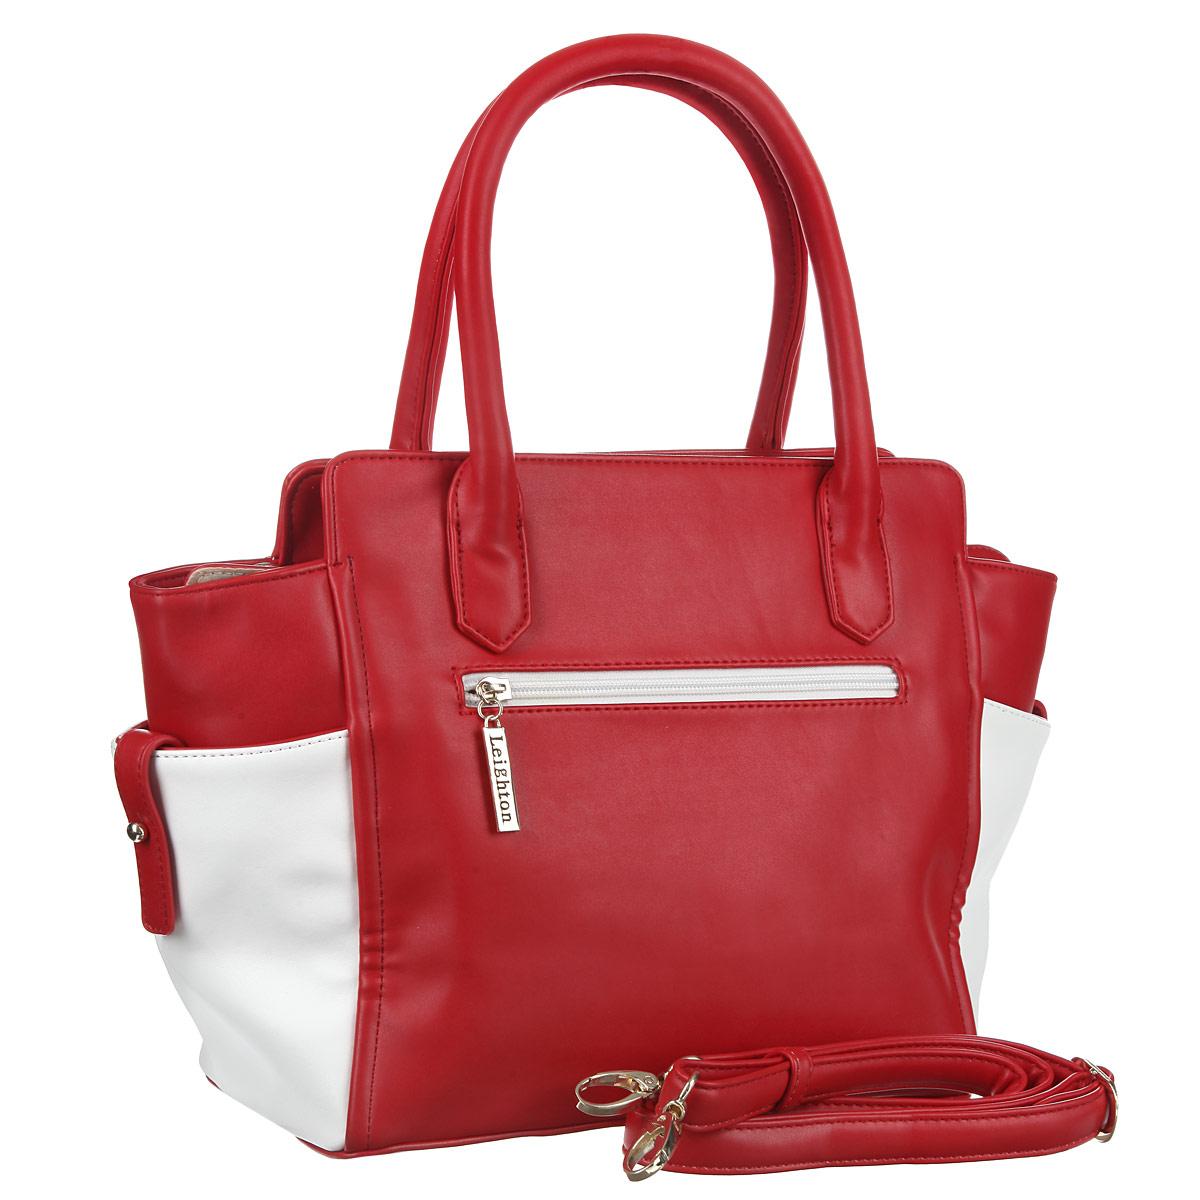 Сумка женская Leighton, цвет: белый, красный. 570164-082/101/082/22 бел ( 570164-082/101/082/22 бел )